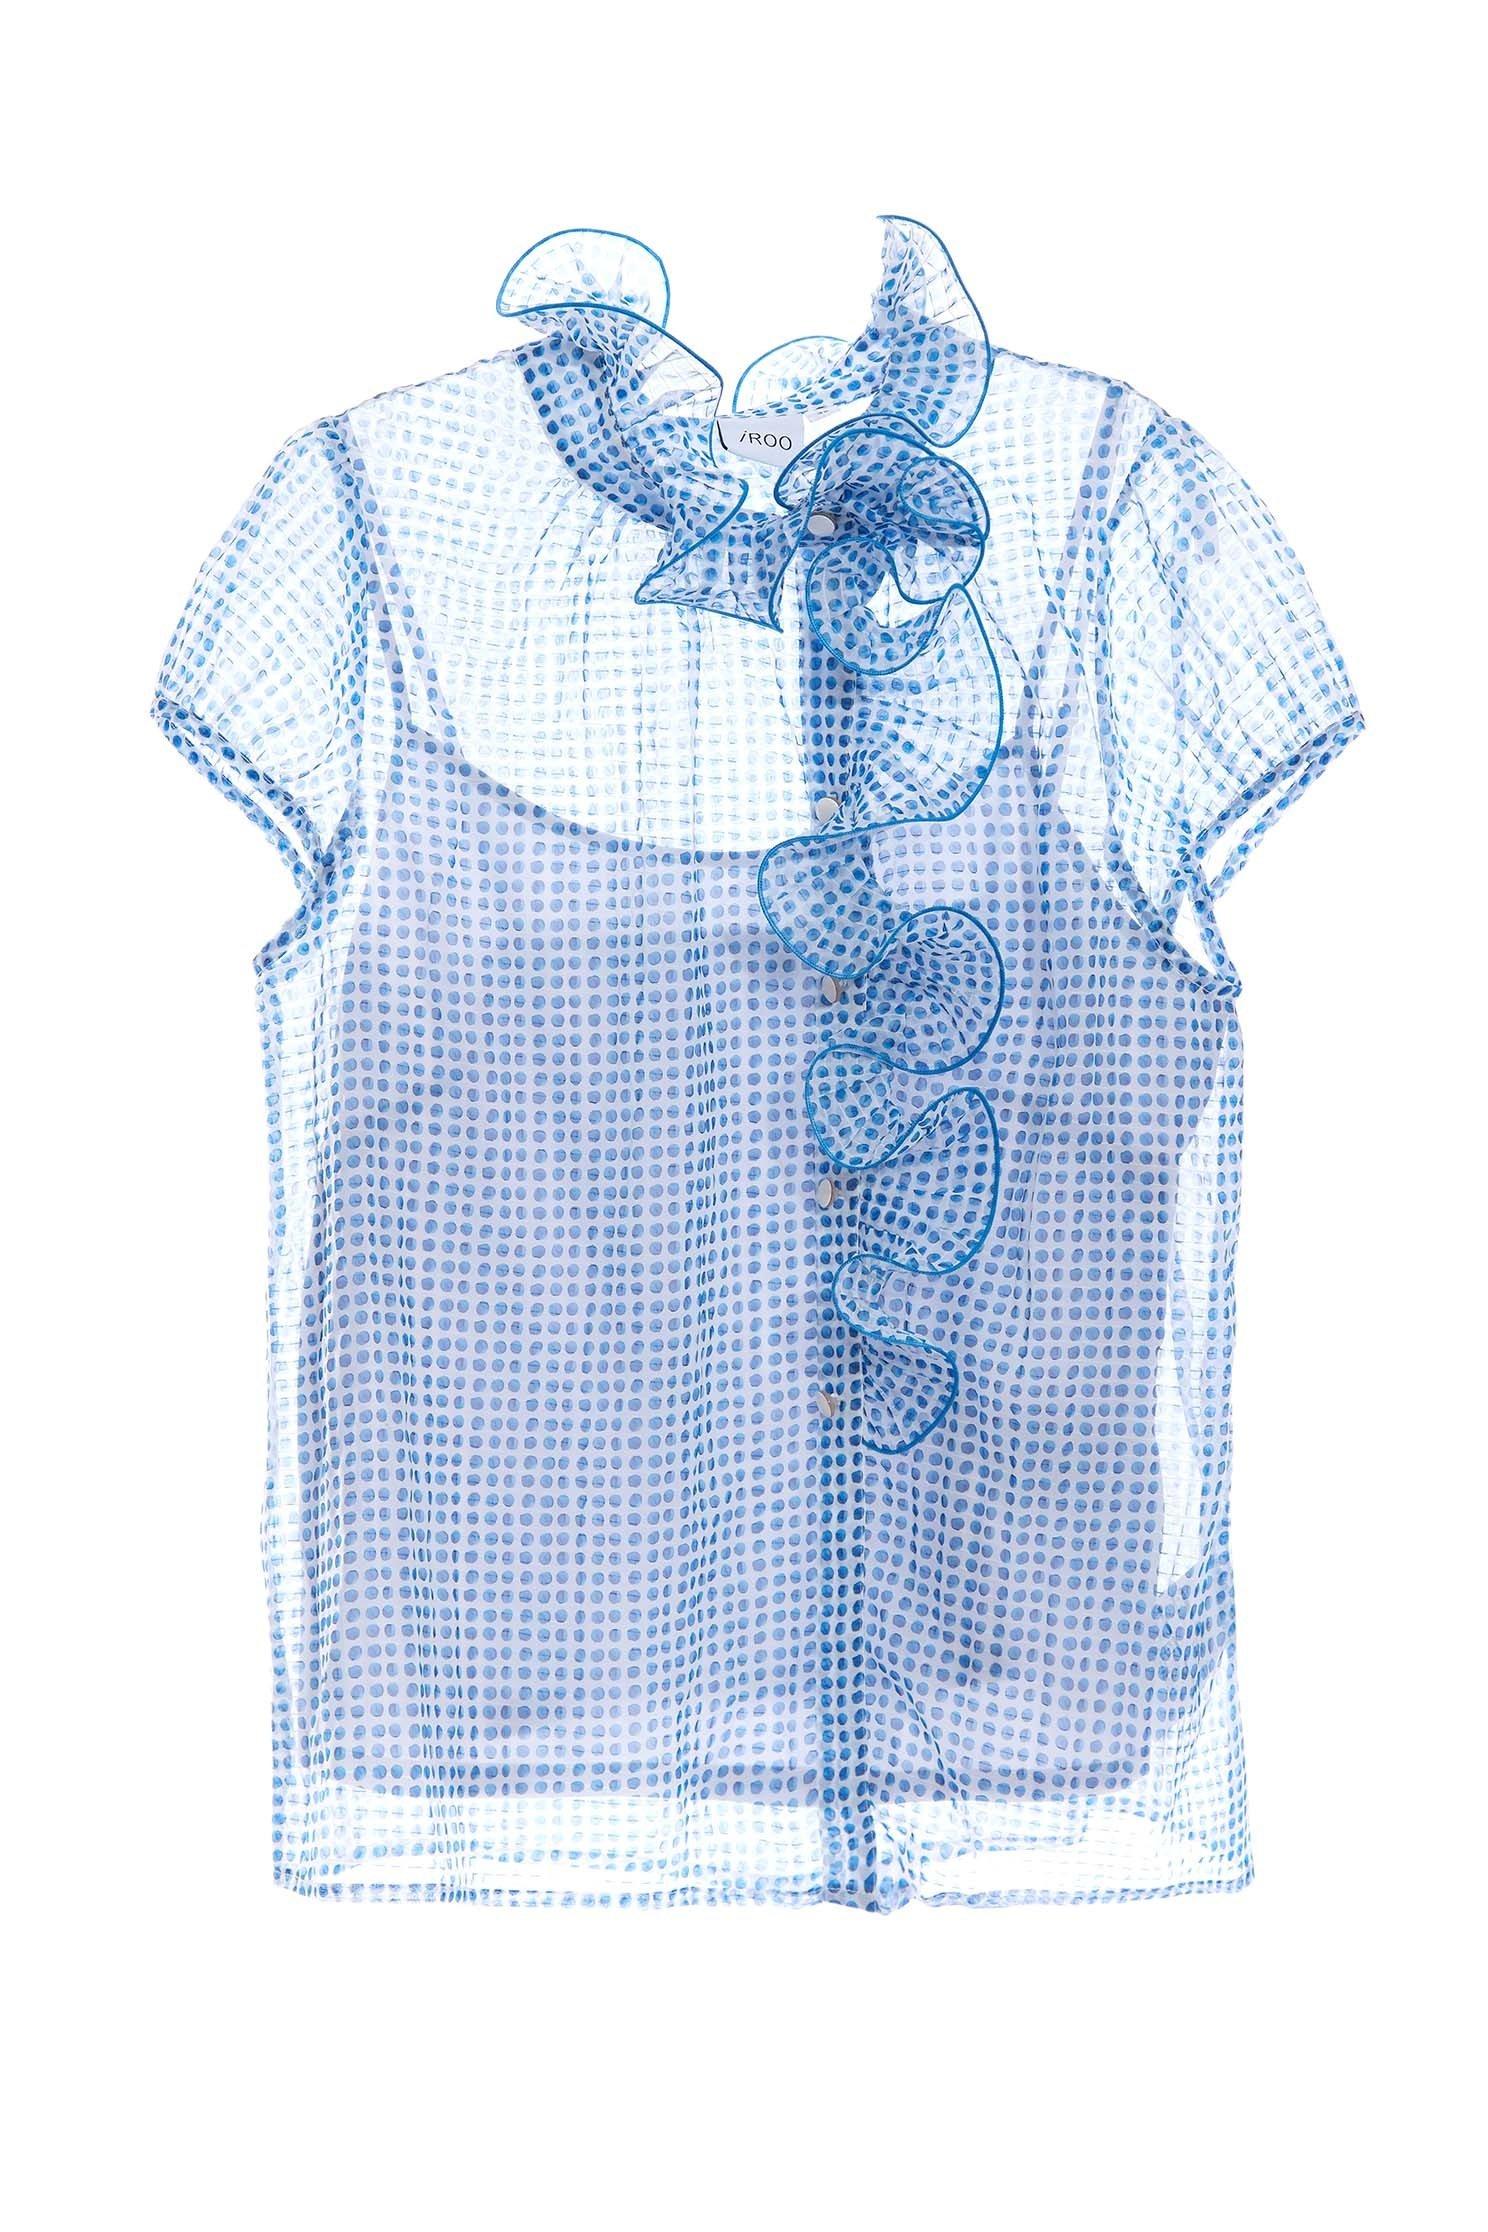 Dot print tulle shirt-style vest,Tops,Season (SS) Look,Restock,Tops,Blouses,Chiffon